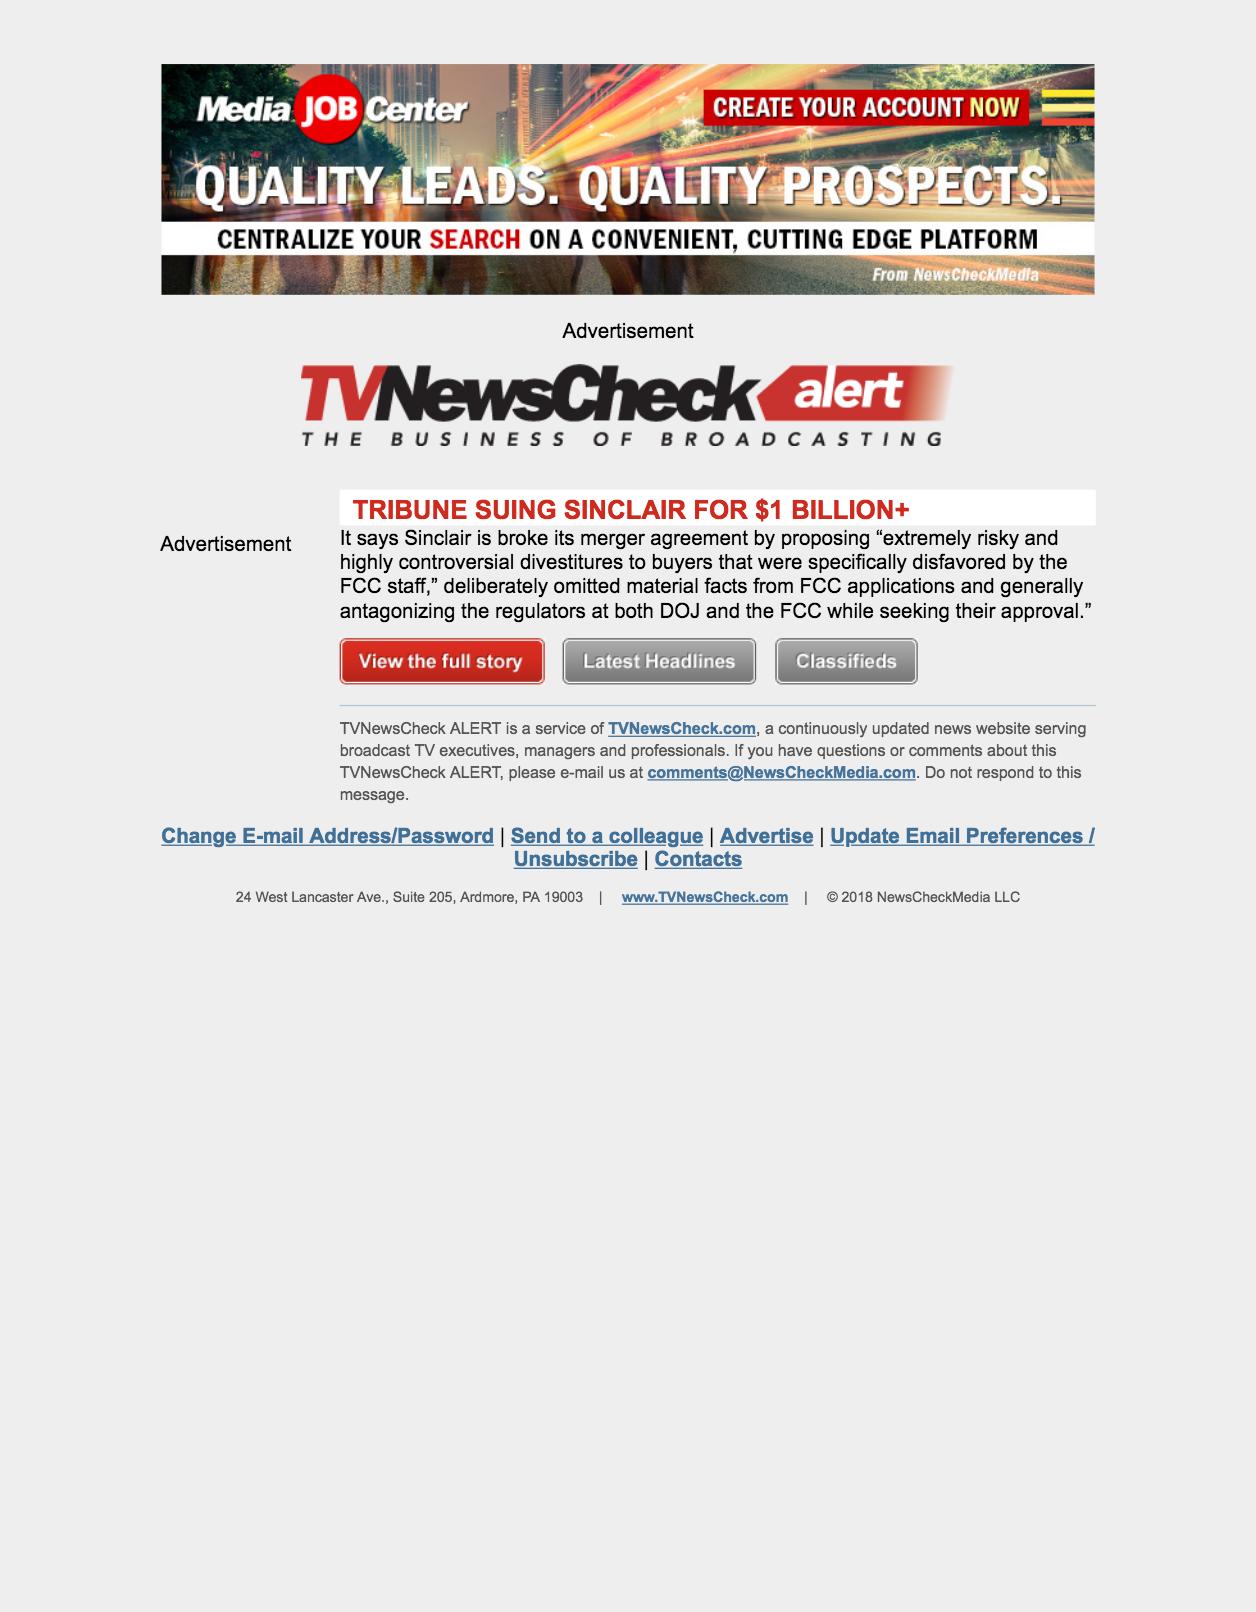 TVNewcheck Alerts